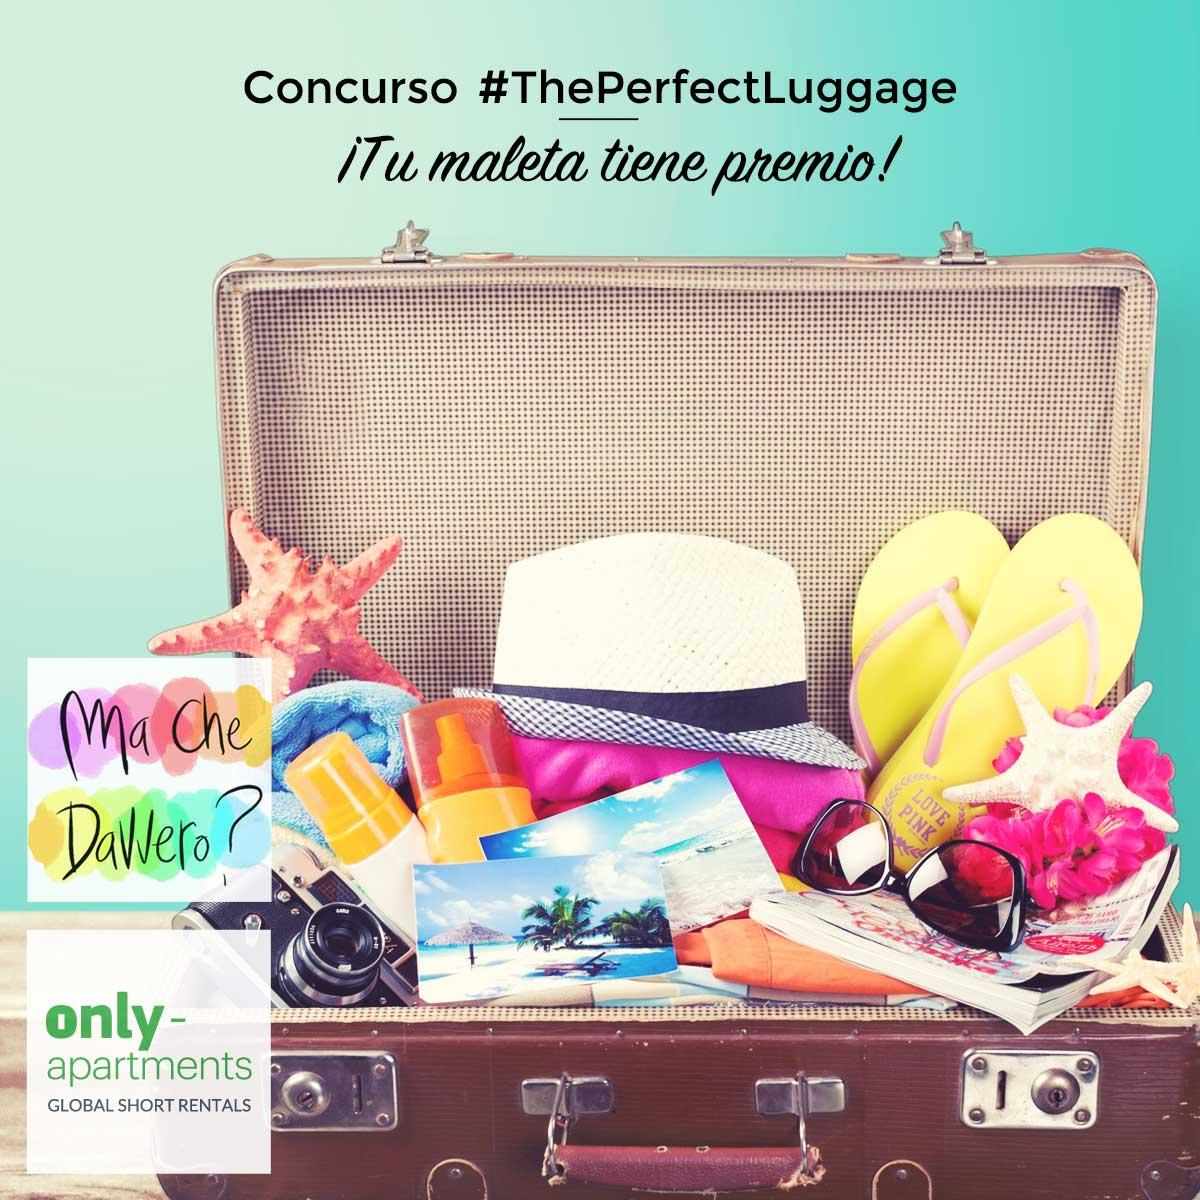 Wettbewerb #ThePerfectLuggage